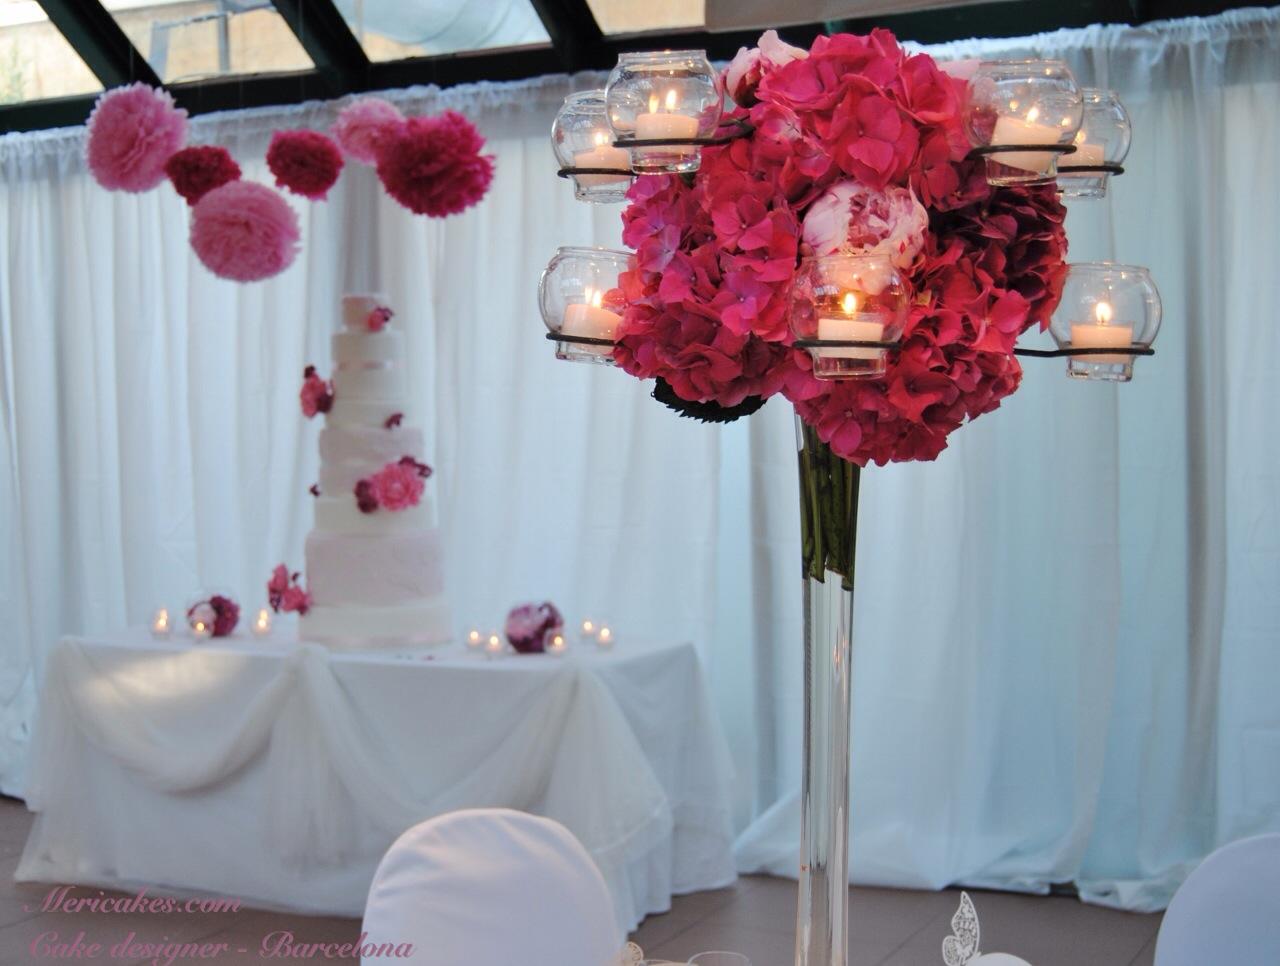 Lace peony wedding cake mericakes cake designer - Decoracion con hortensias ...